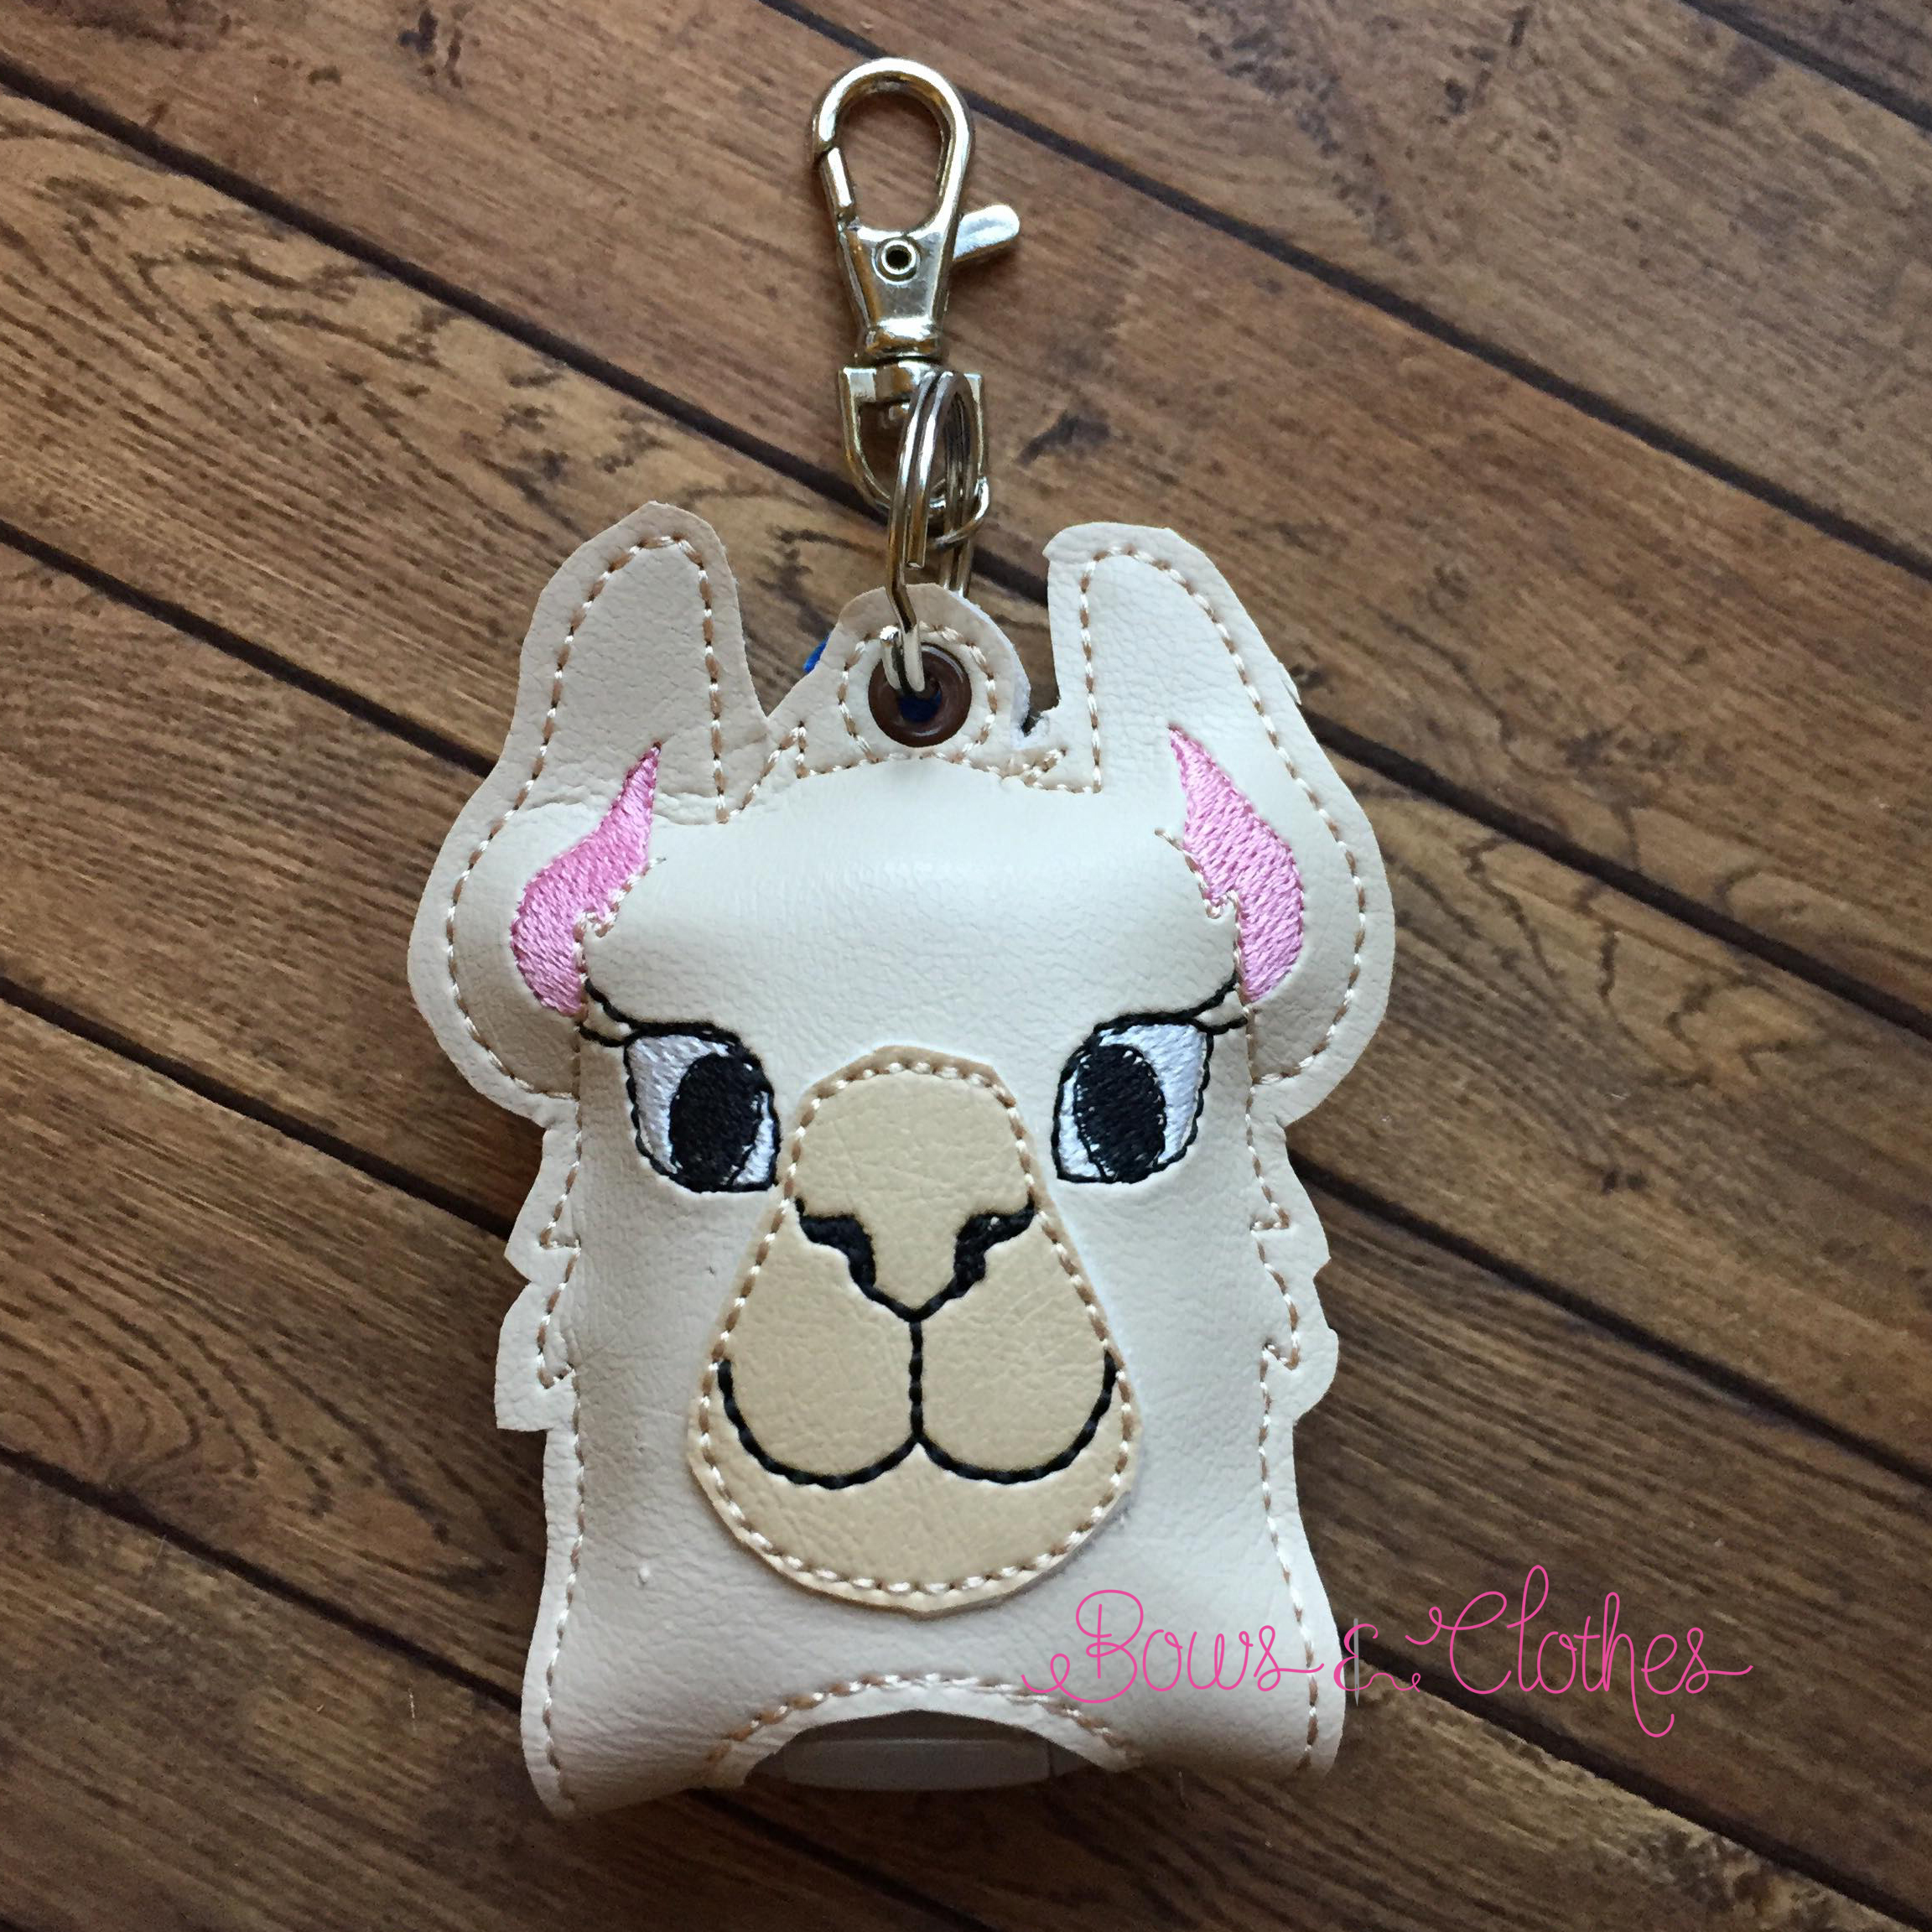 Llama Alpaca Open Tab Hand Sanitizer Bows And Clothes